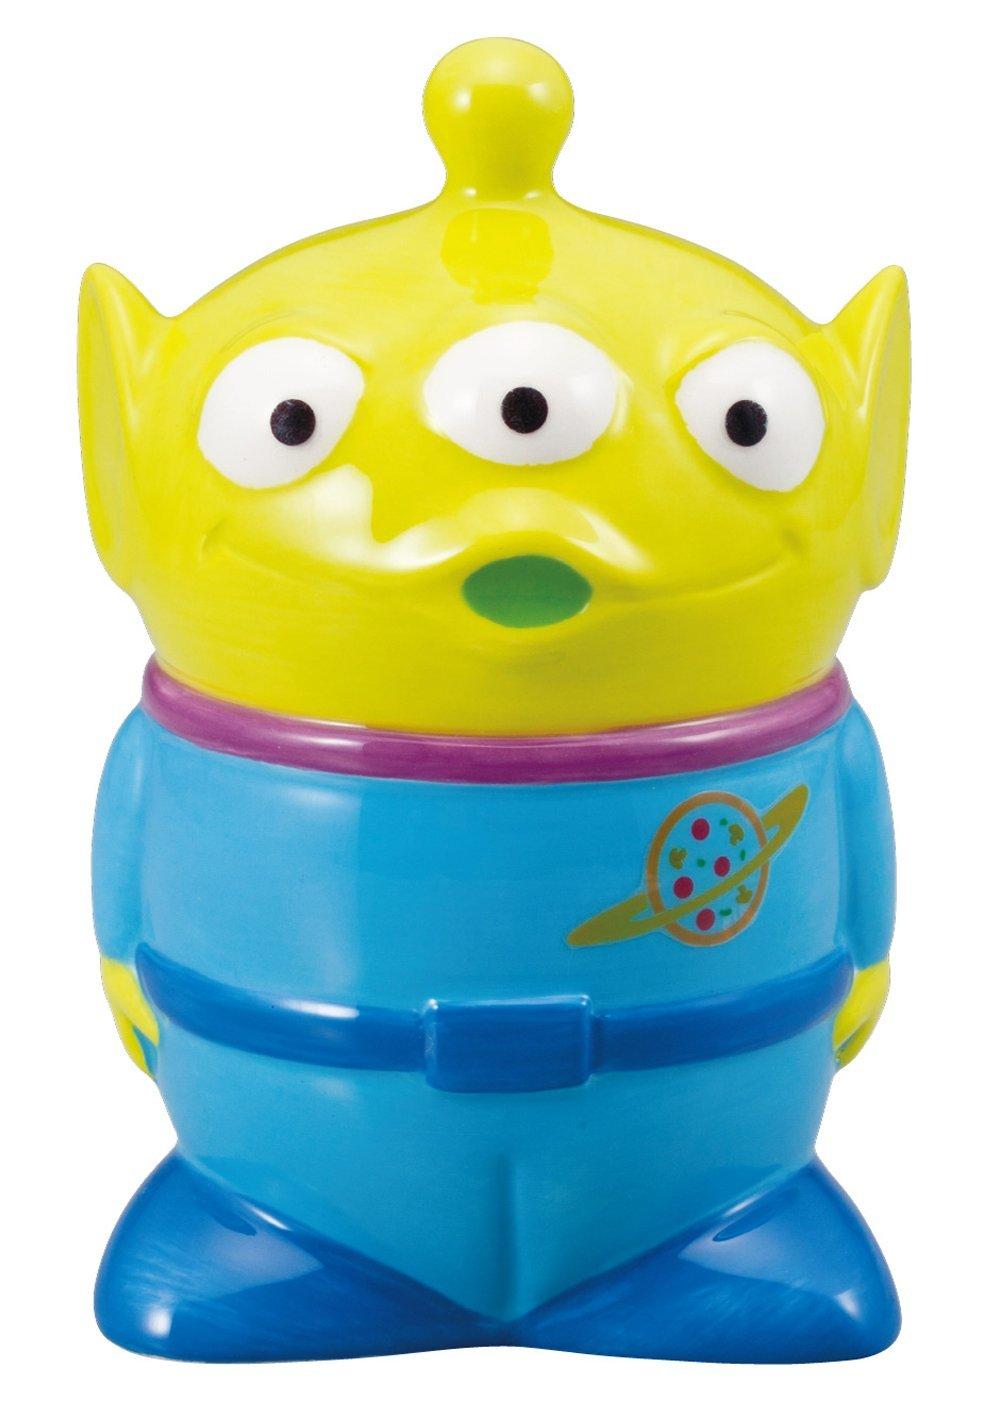 X射線【C229346】三眼怪造型陶瓷存錢筒,玩具總動員/撲滿/錢筒/儲蓄罐/存錢罐/悶葫蘆罐/聚財神器